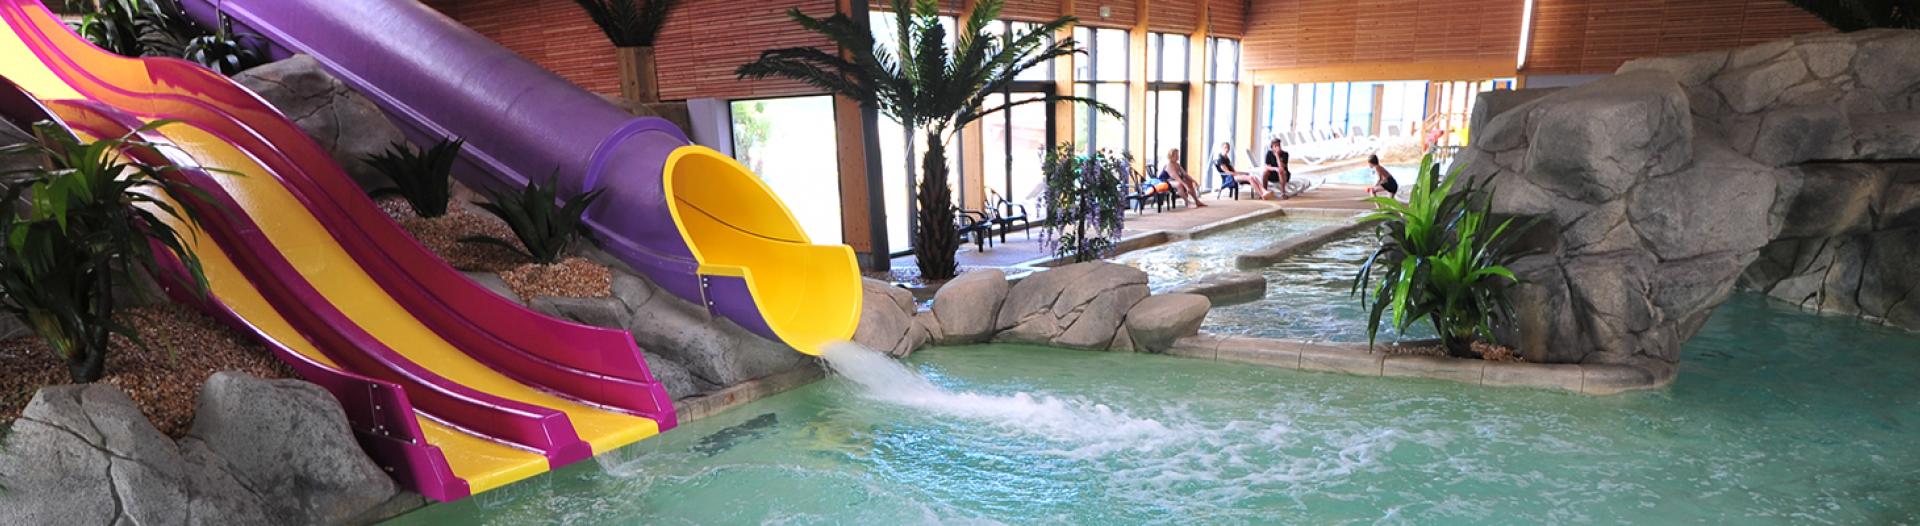 piscine couverte camping ocean - Camping Dans Le Verdon Avec Piscine